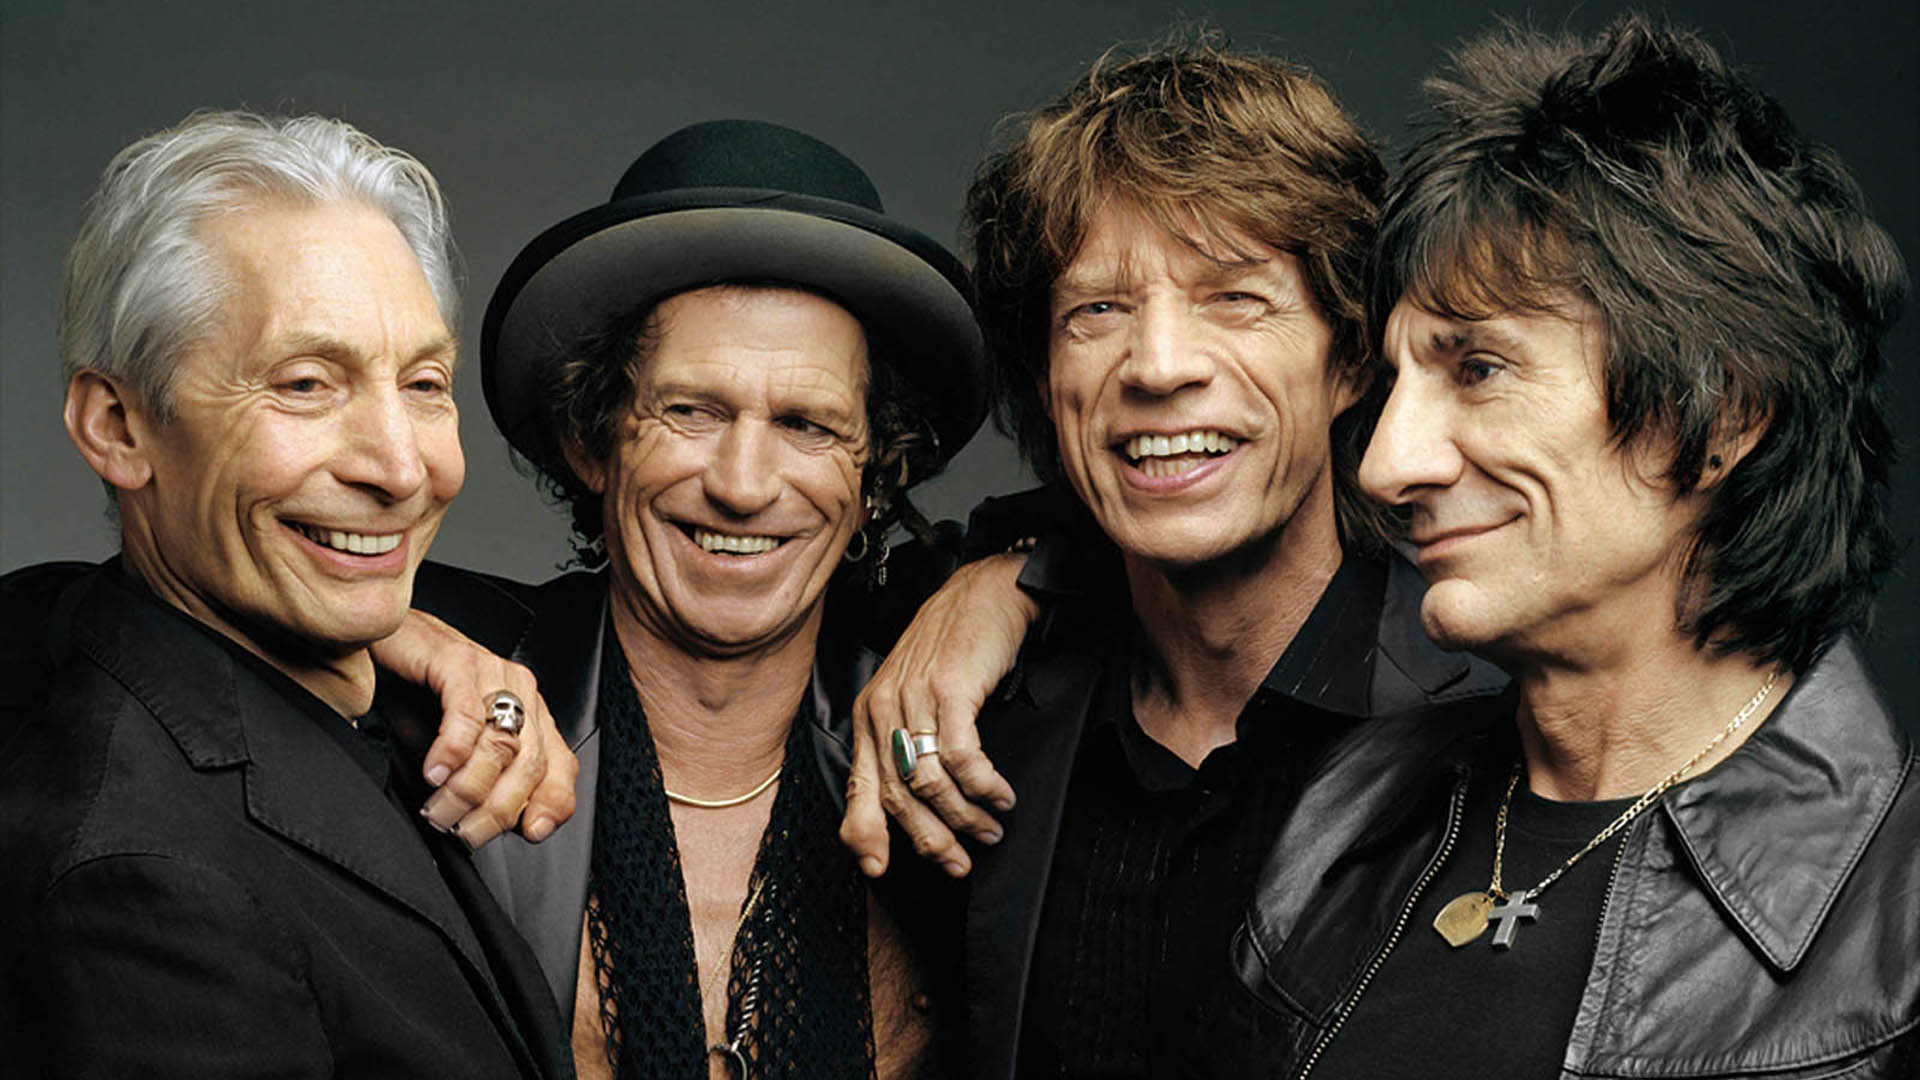 ATL Rock - Especial Rolling Stones